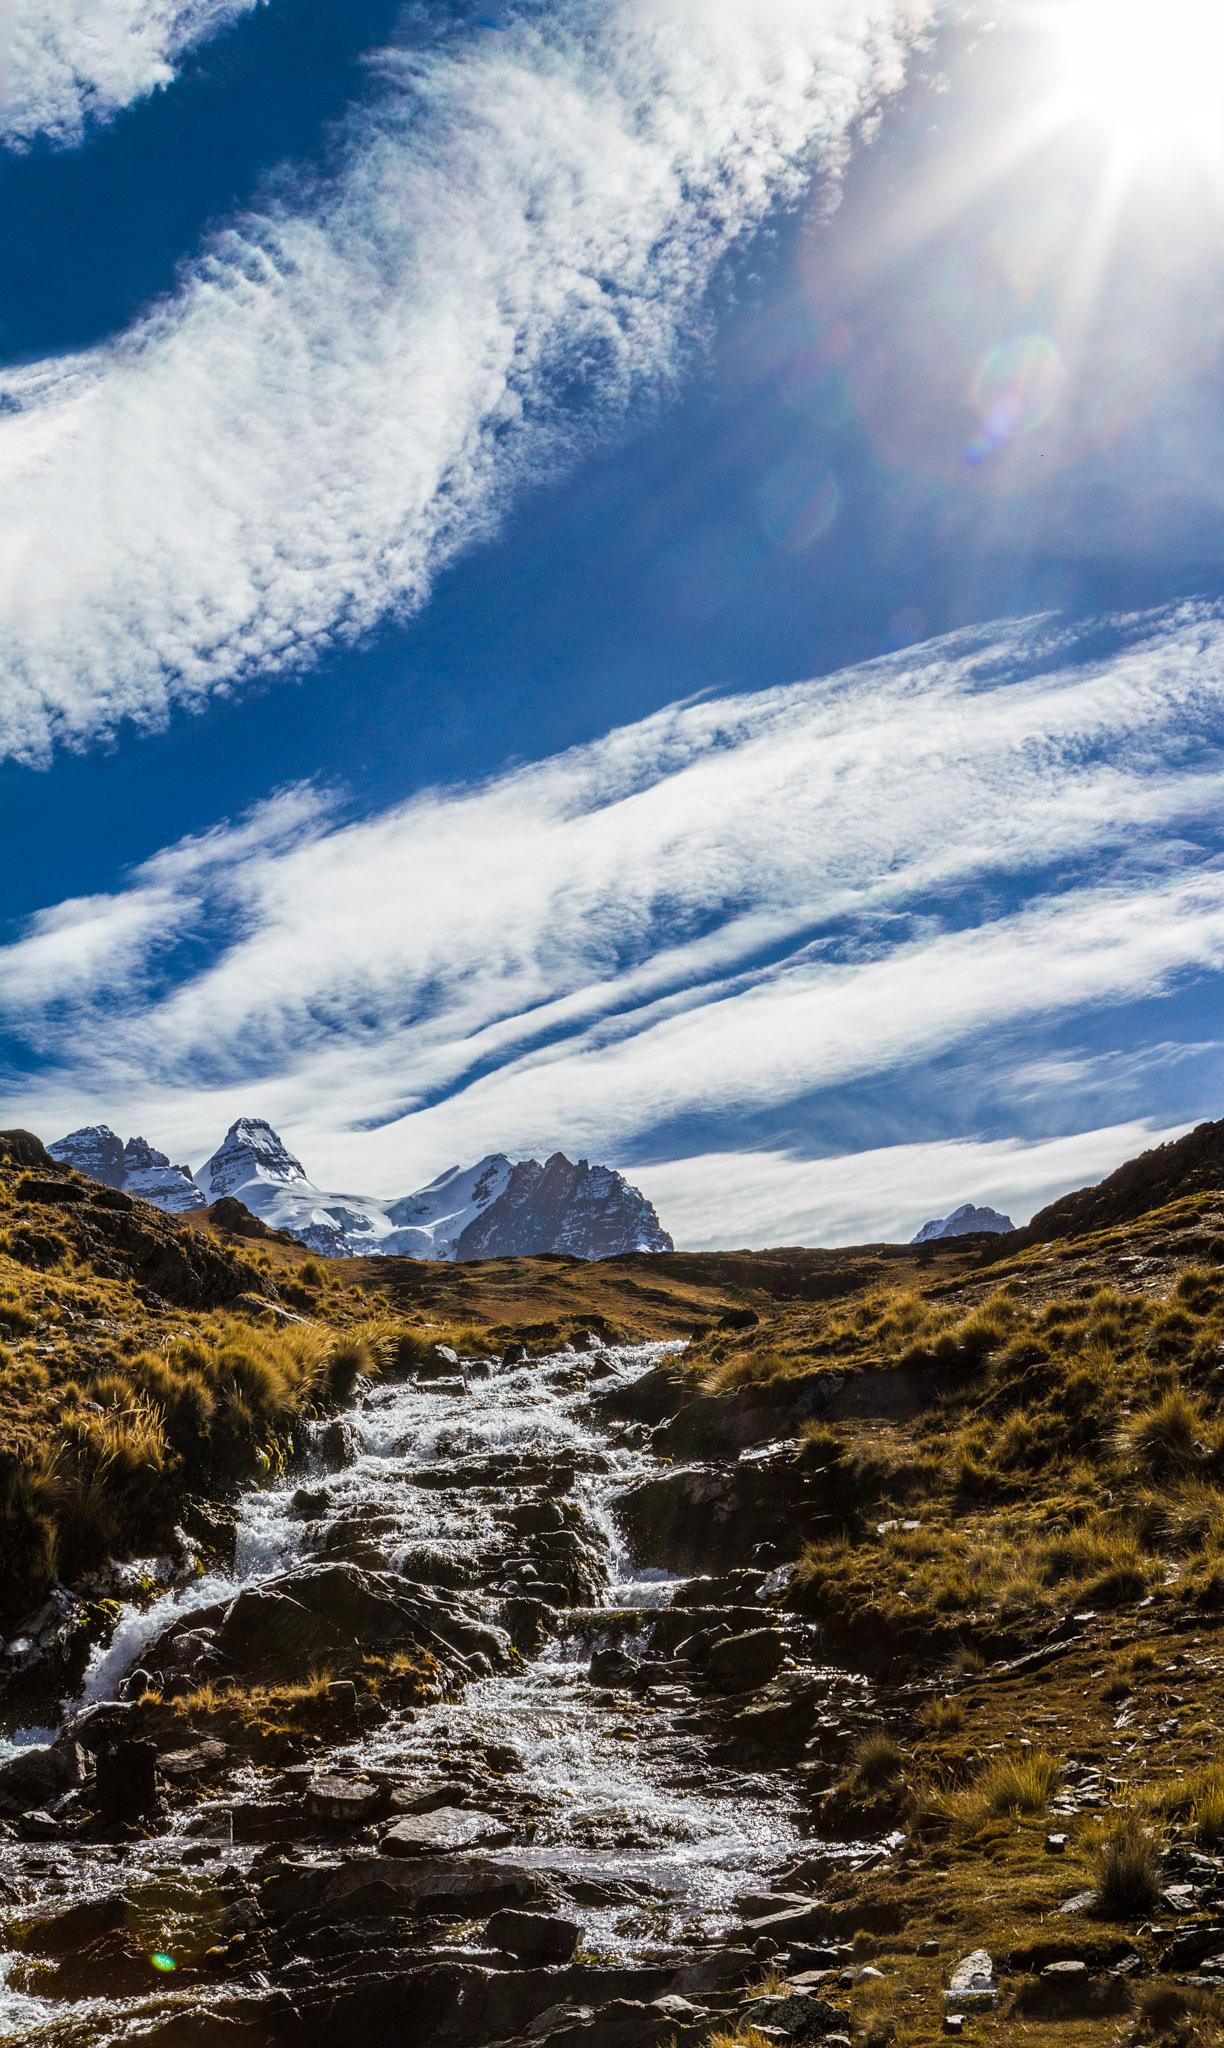 Ali-Barqawi-Studios-Explore-Series-Travel-Adventure-Documentary-C4CGAZA-Bolivia-Mount-Tarija-2015-247.jpg